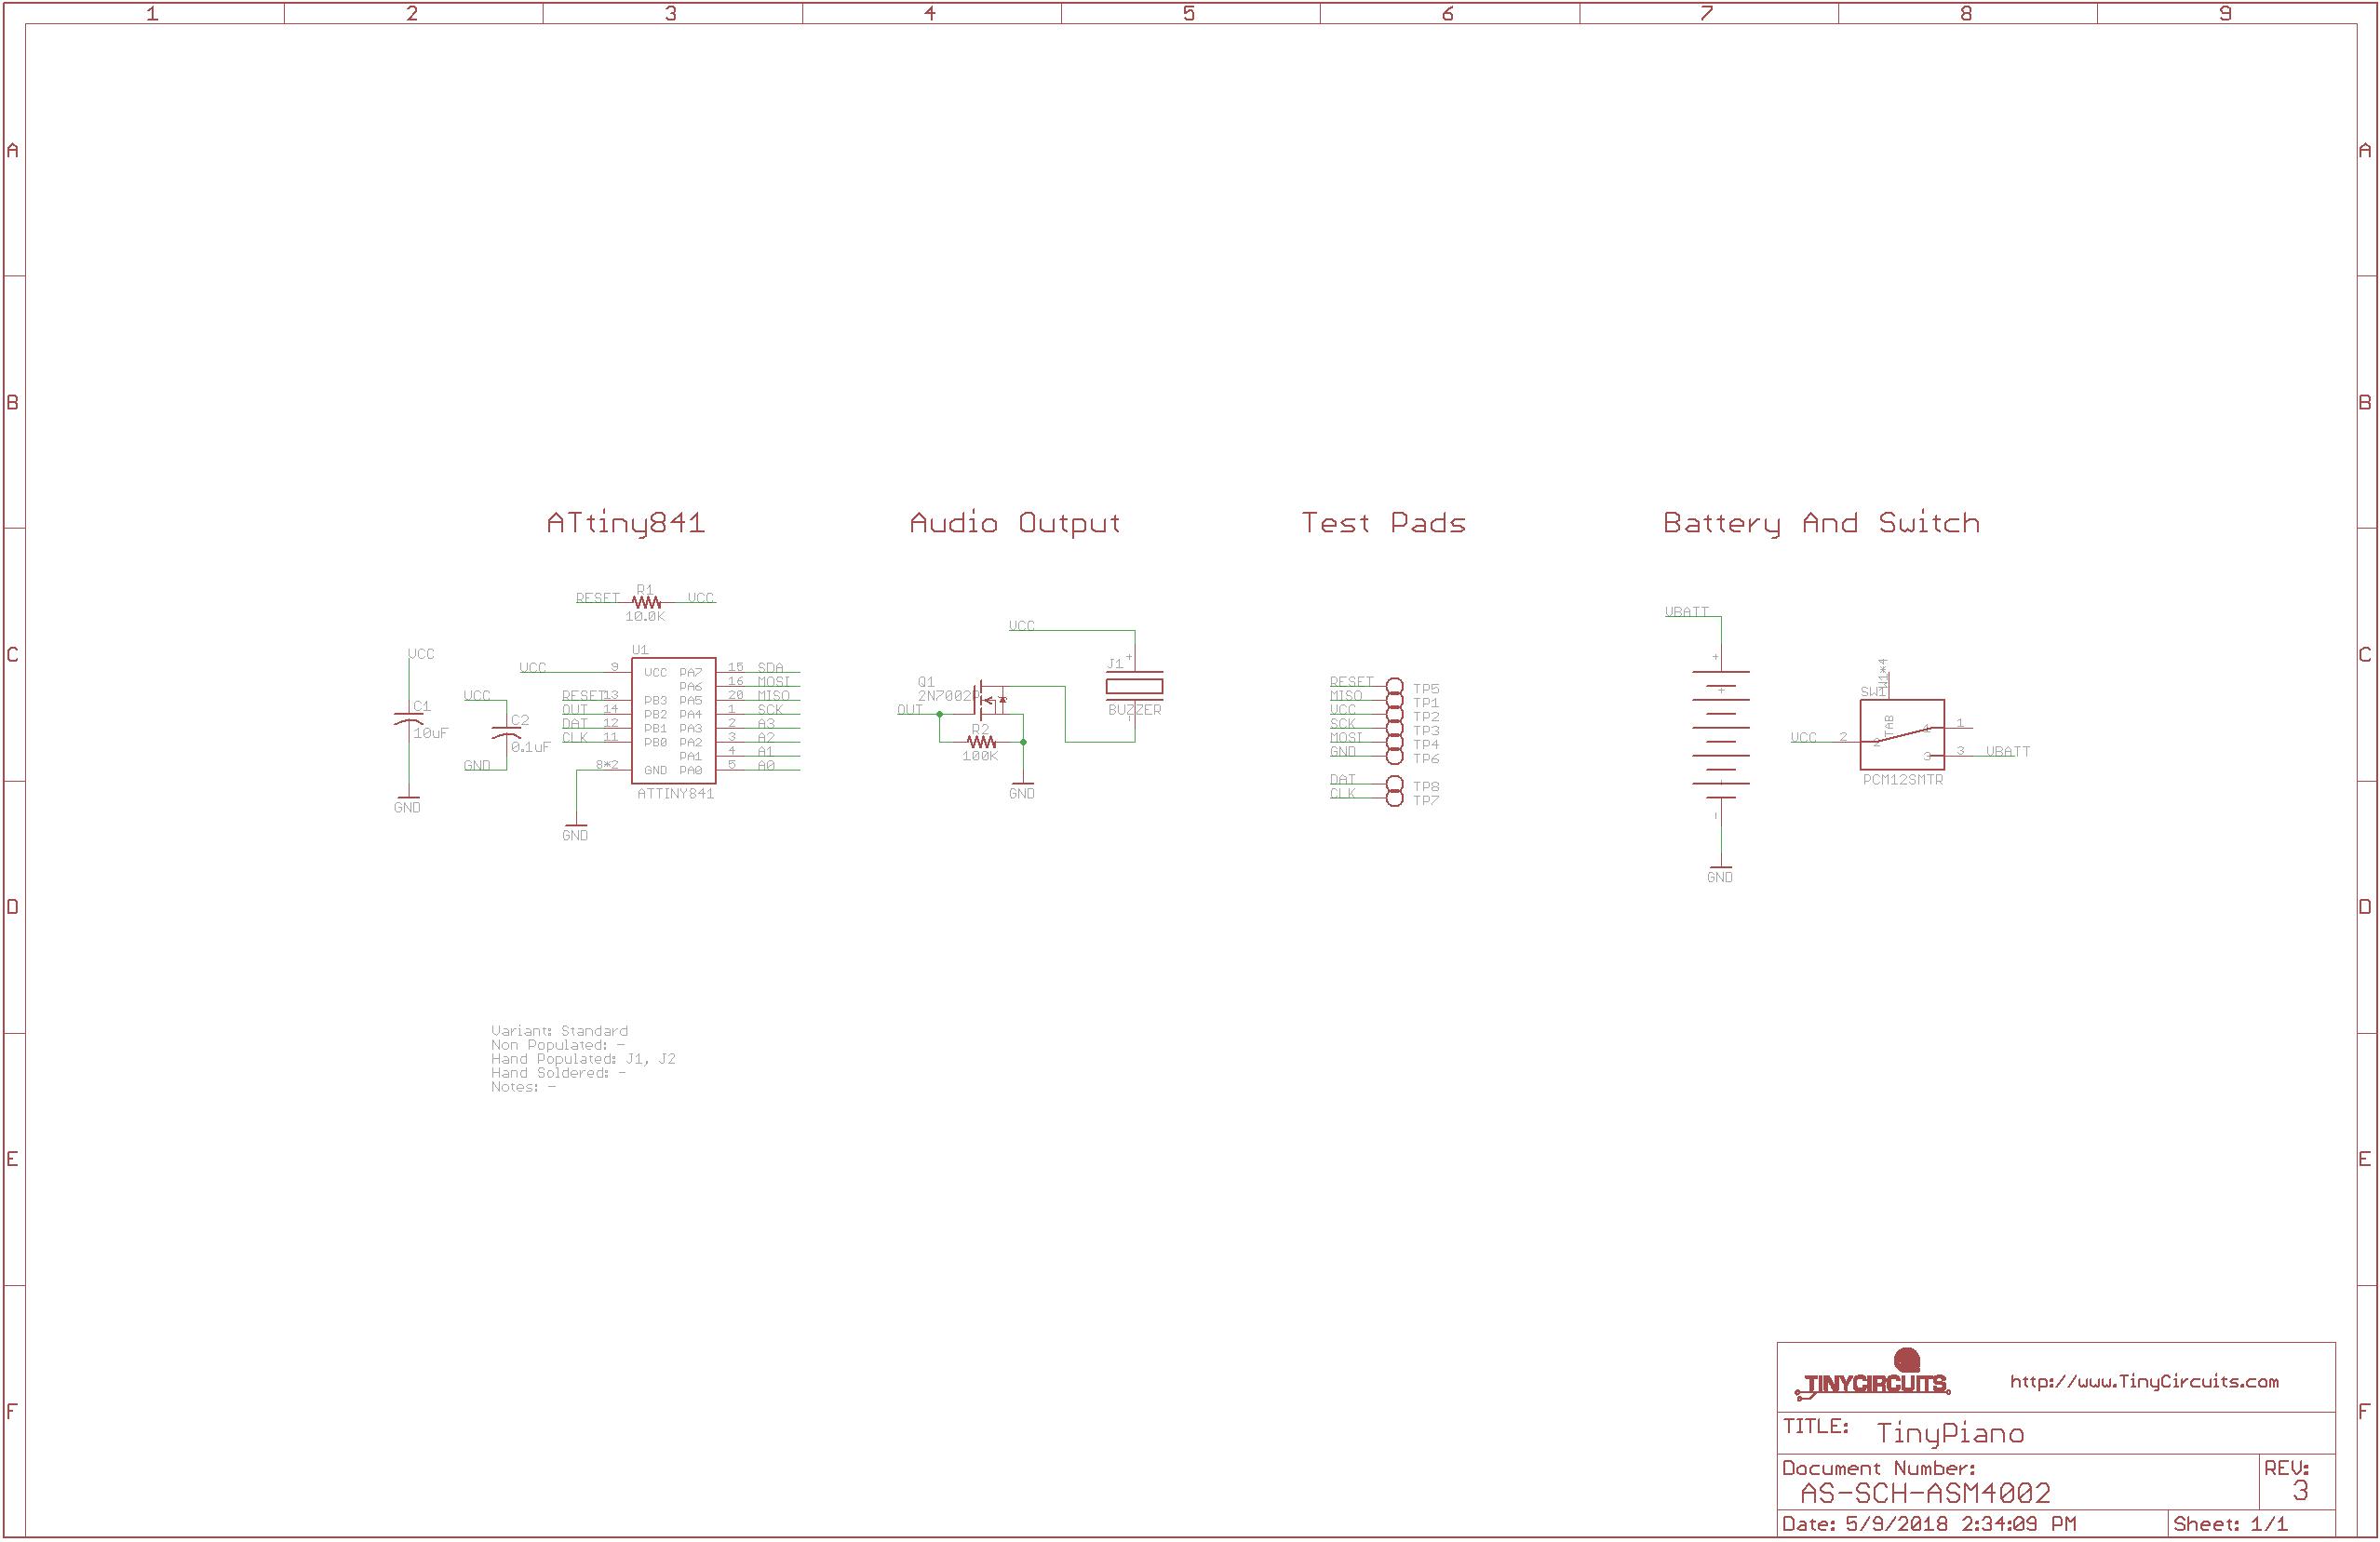 TinyPiano schematic